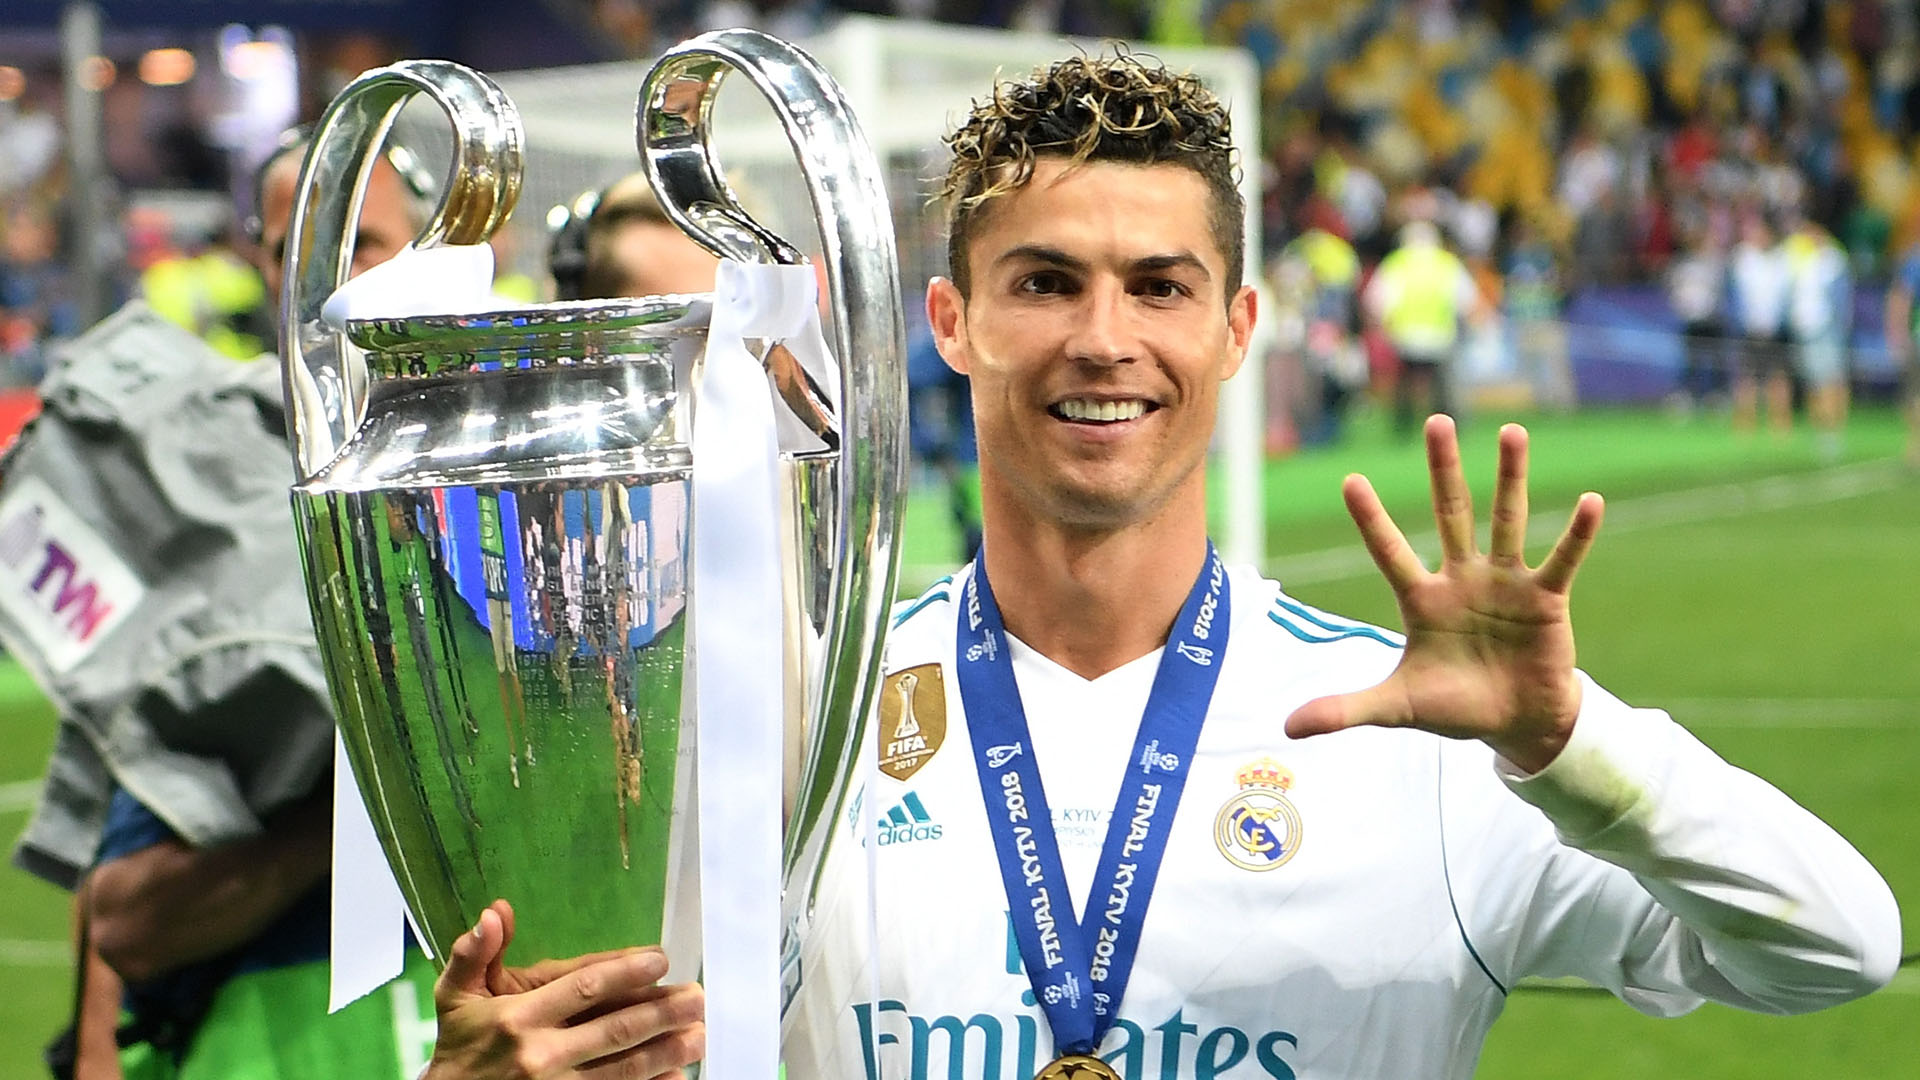 Real Madrid: No Cristiano, No Champions League Glory? Real Madrid's